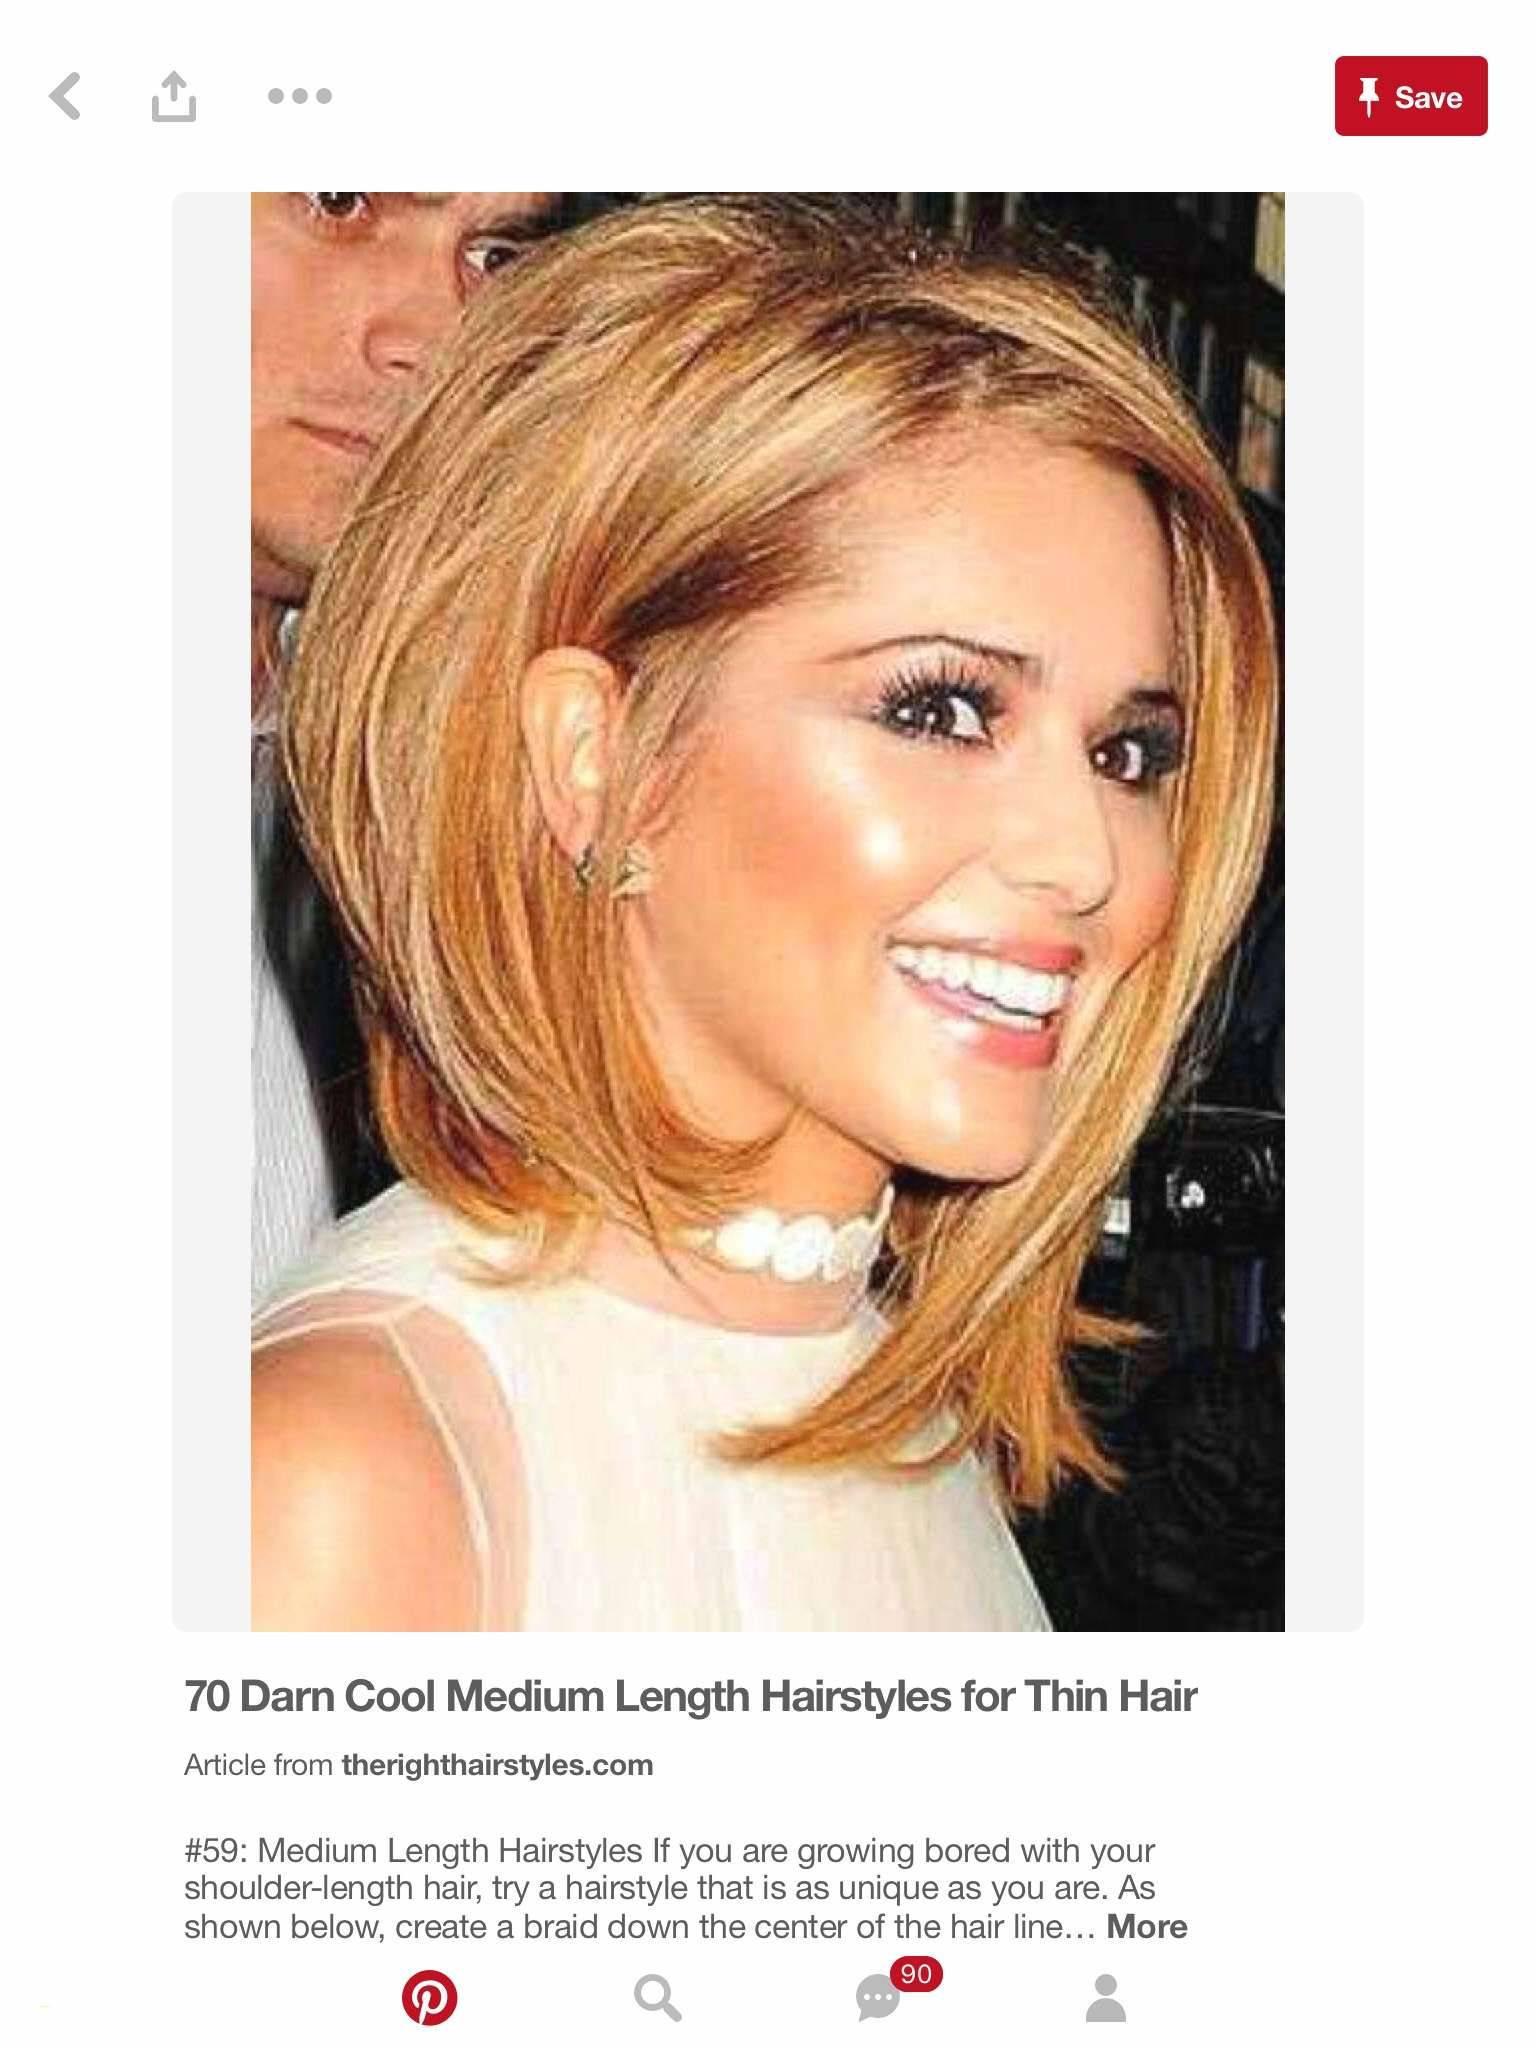 How to Make A Hairstyle for Thin Hair Wedding Hairstyles for Thin Hair Unique Bob Hairstyles for Thin Hair